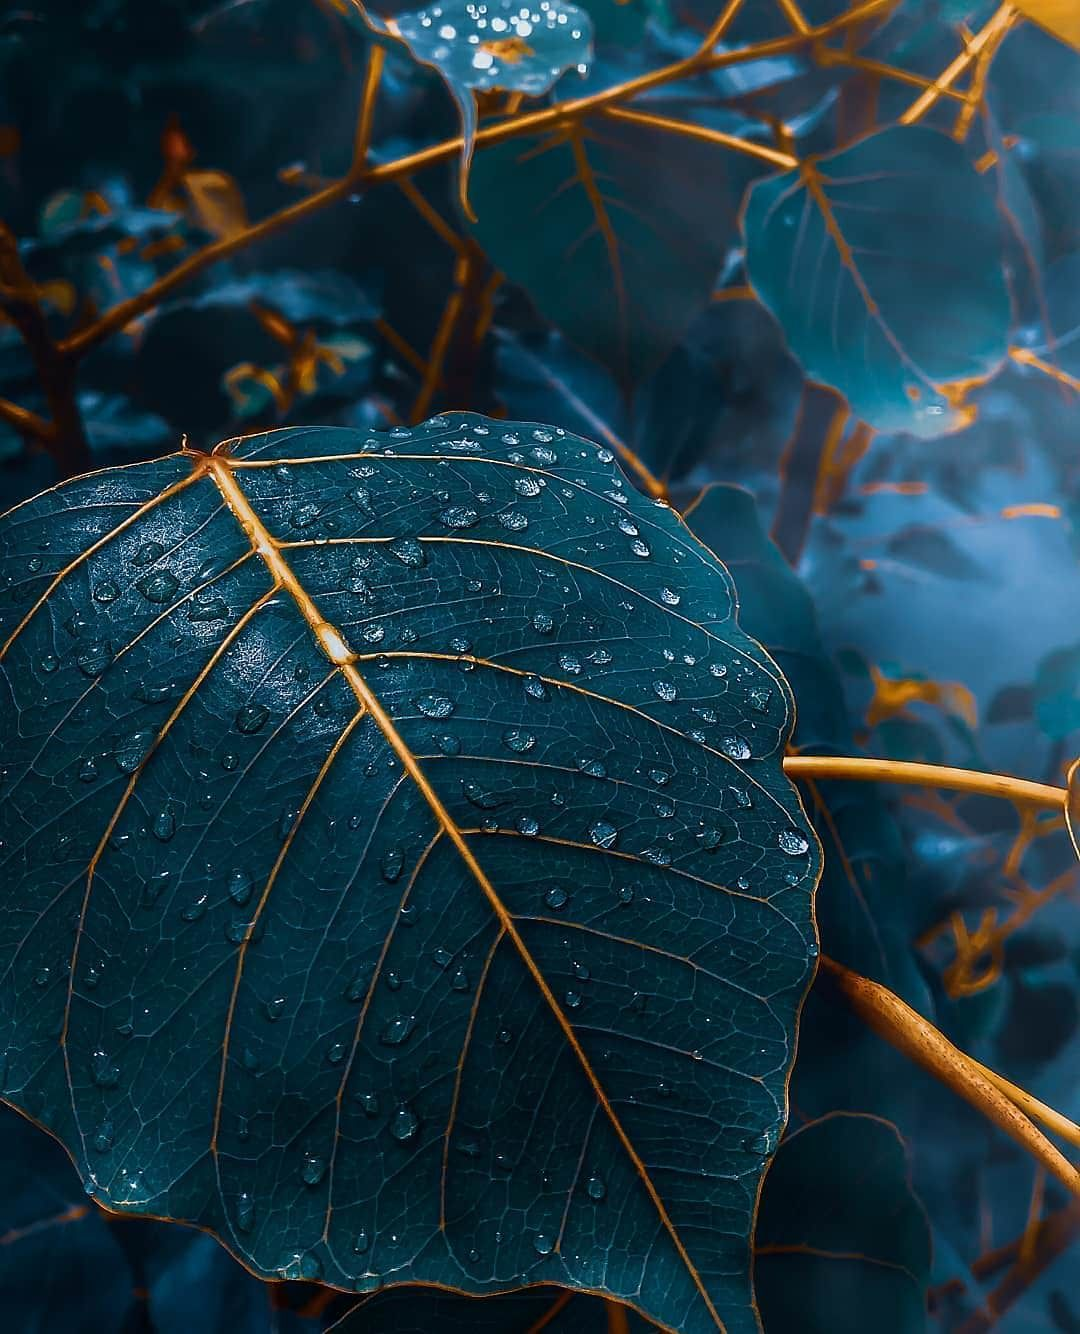 Fall time blue elegant leaves Fall background wallpaper